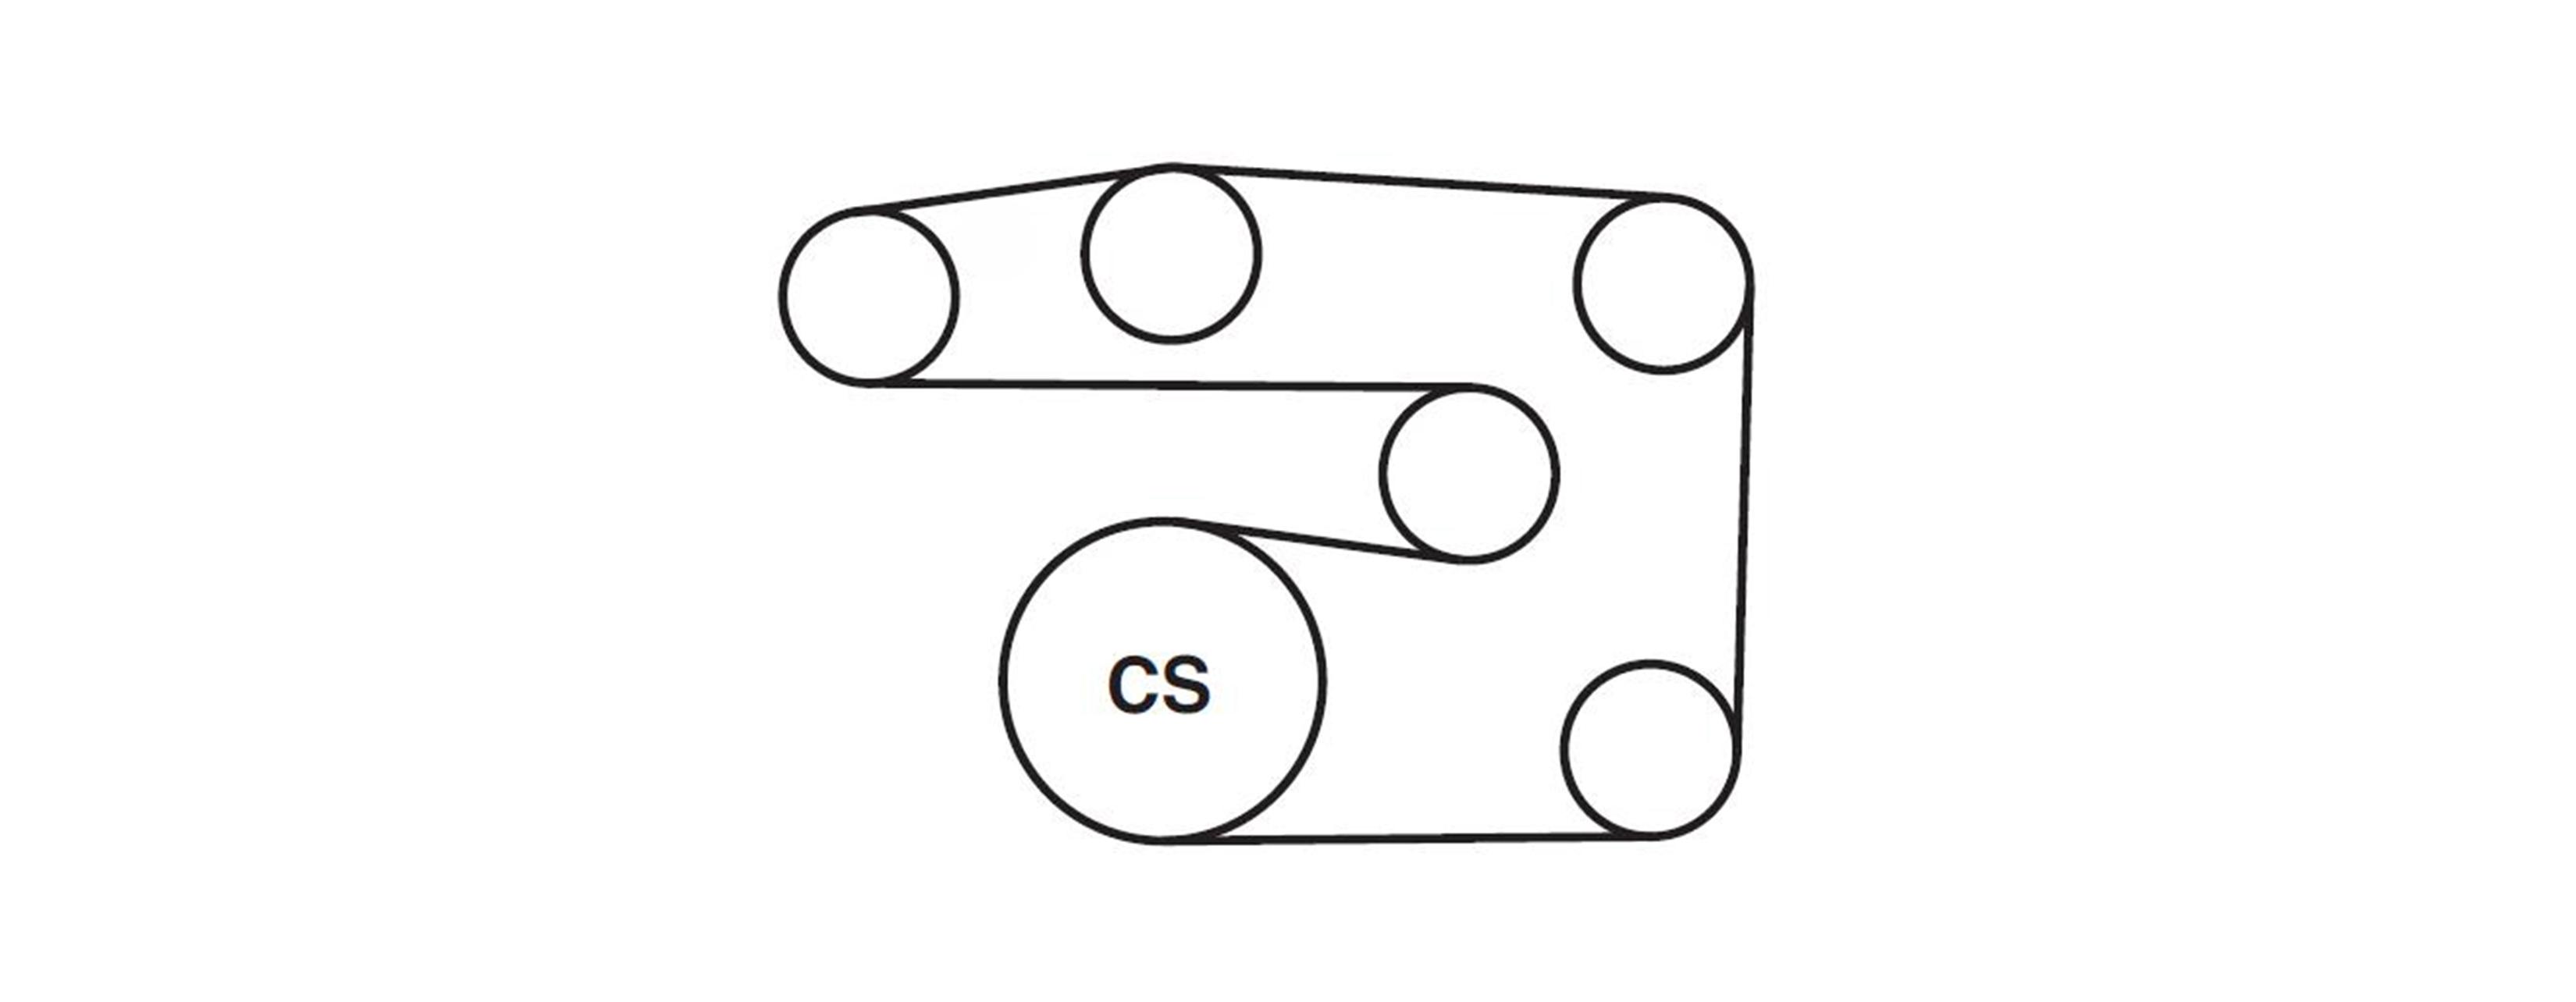 2013 chevrolet malibu engine diagram 2014 chevrolet serpentine belt diagrams     ricks free auto repair  2014 chevrolet serpentine belt diagrams